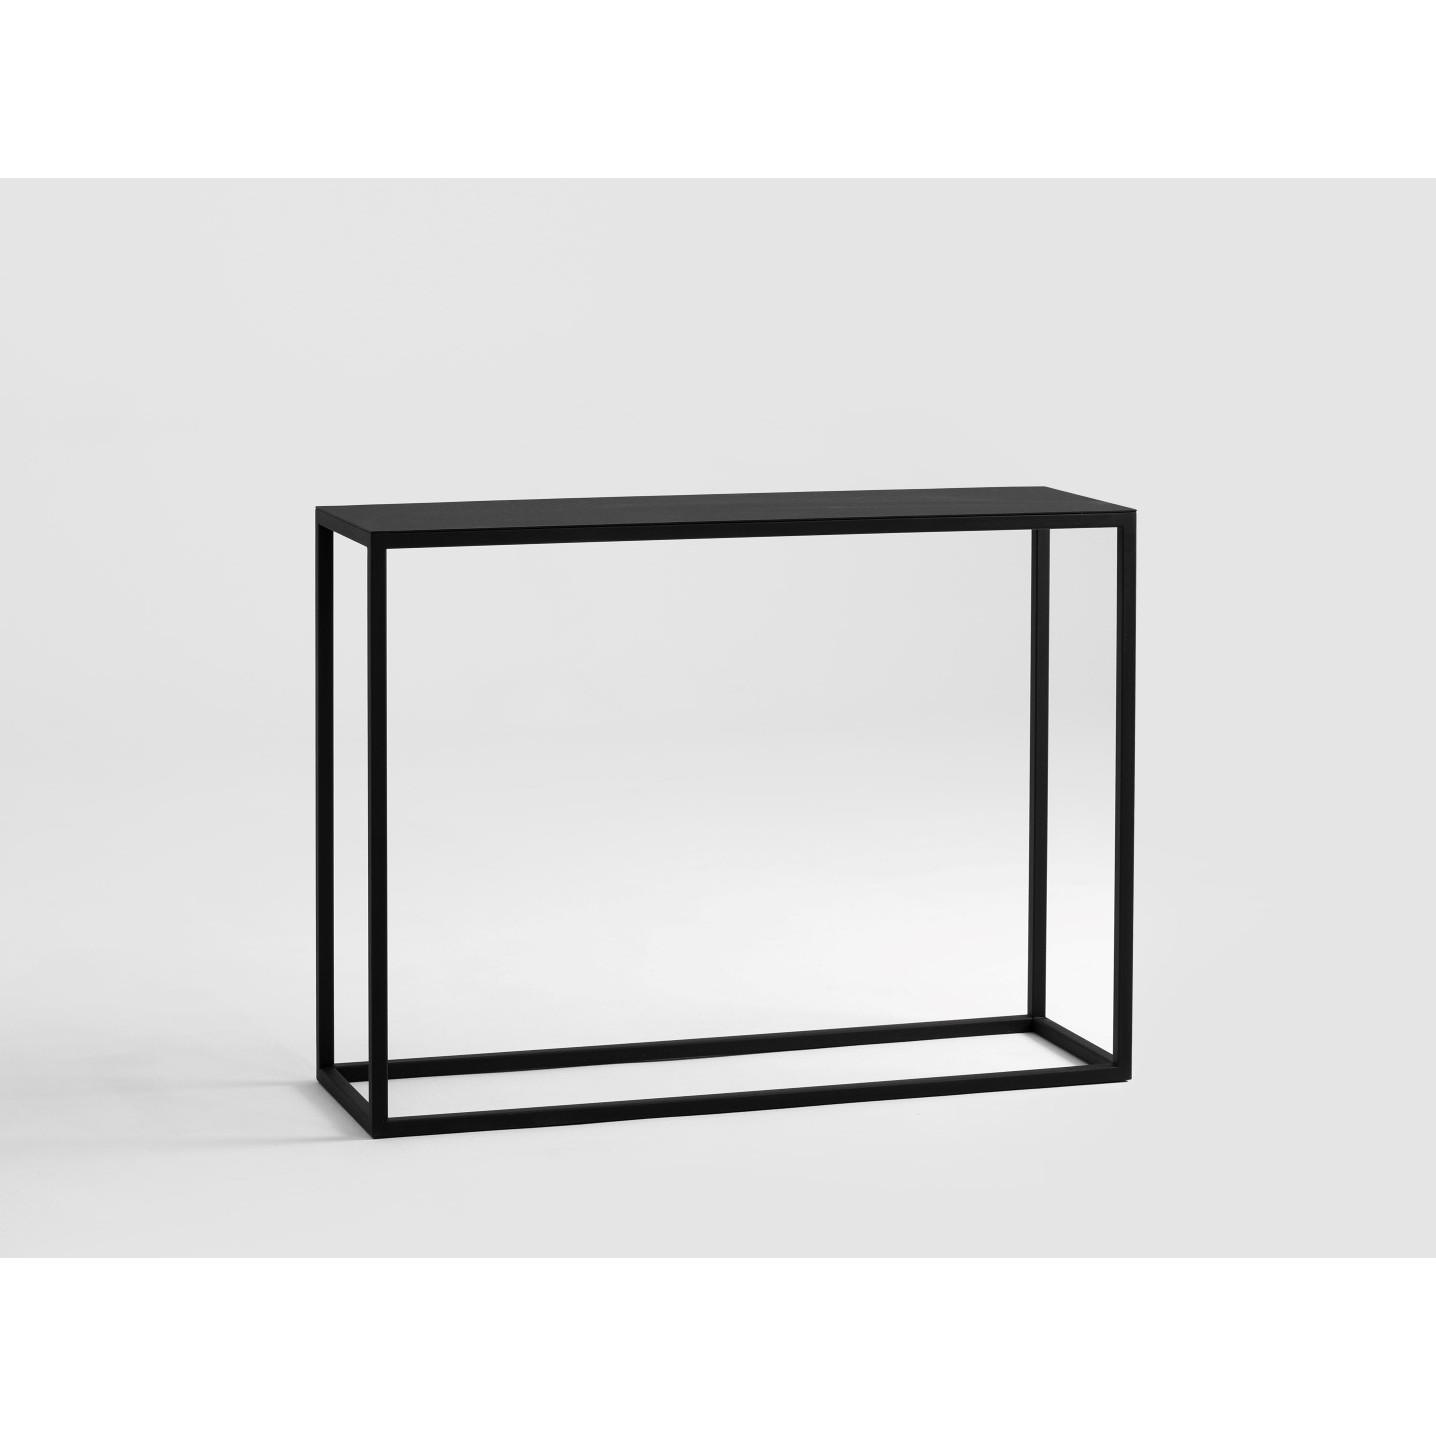 Regal Julita 75 cm | Schwarz